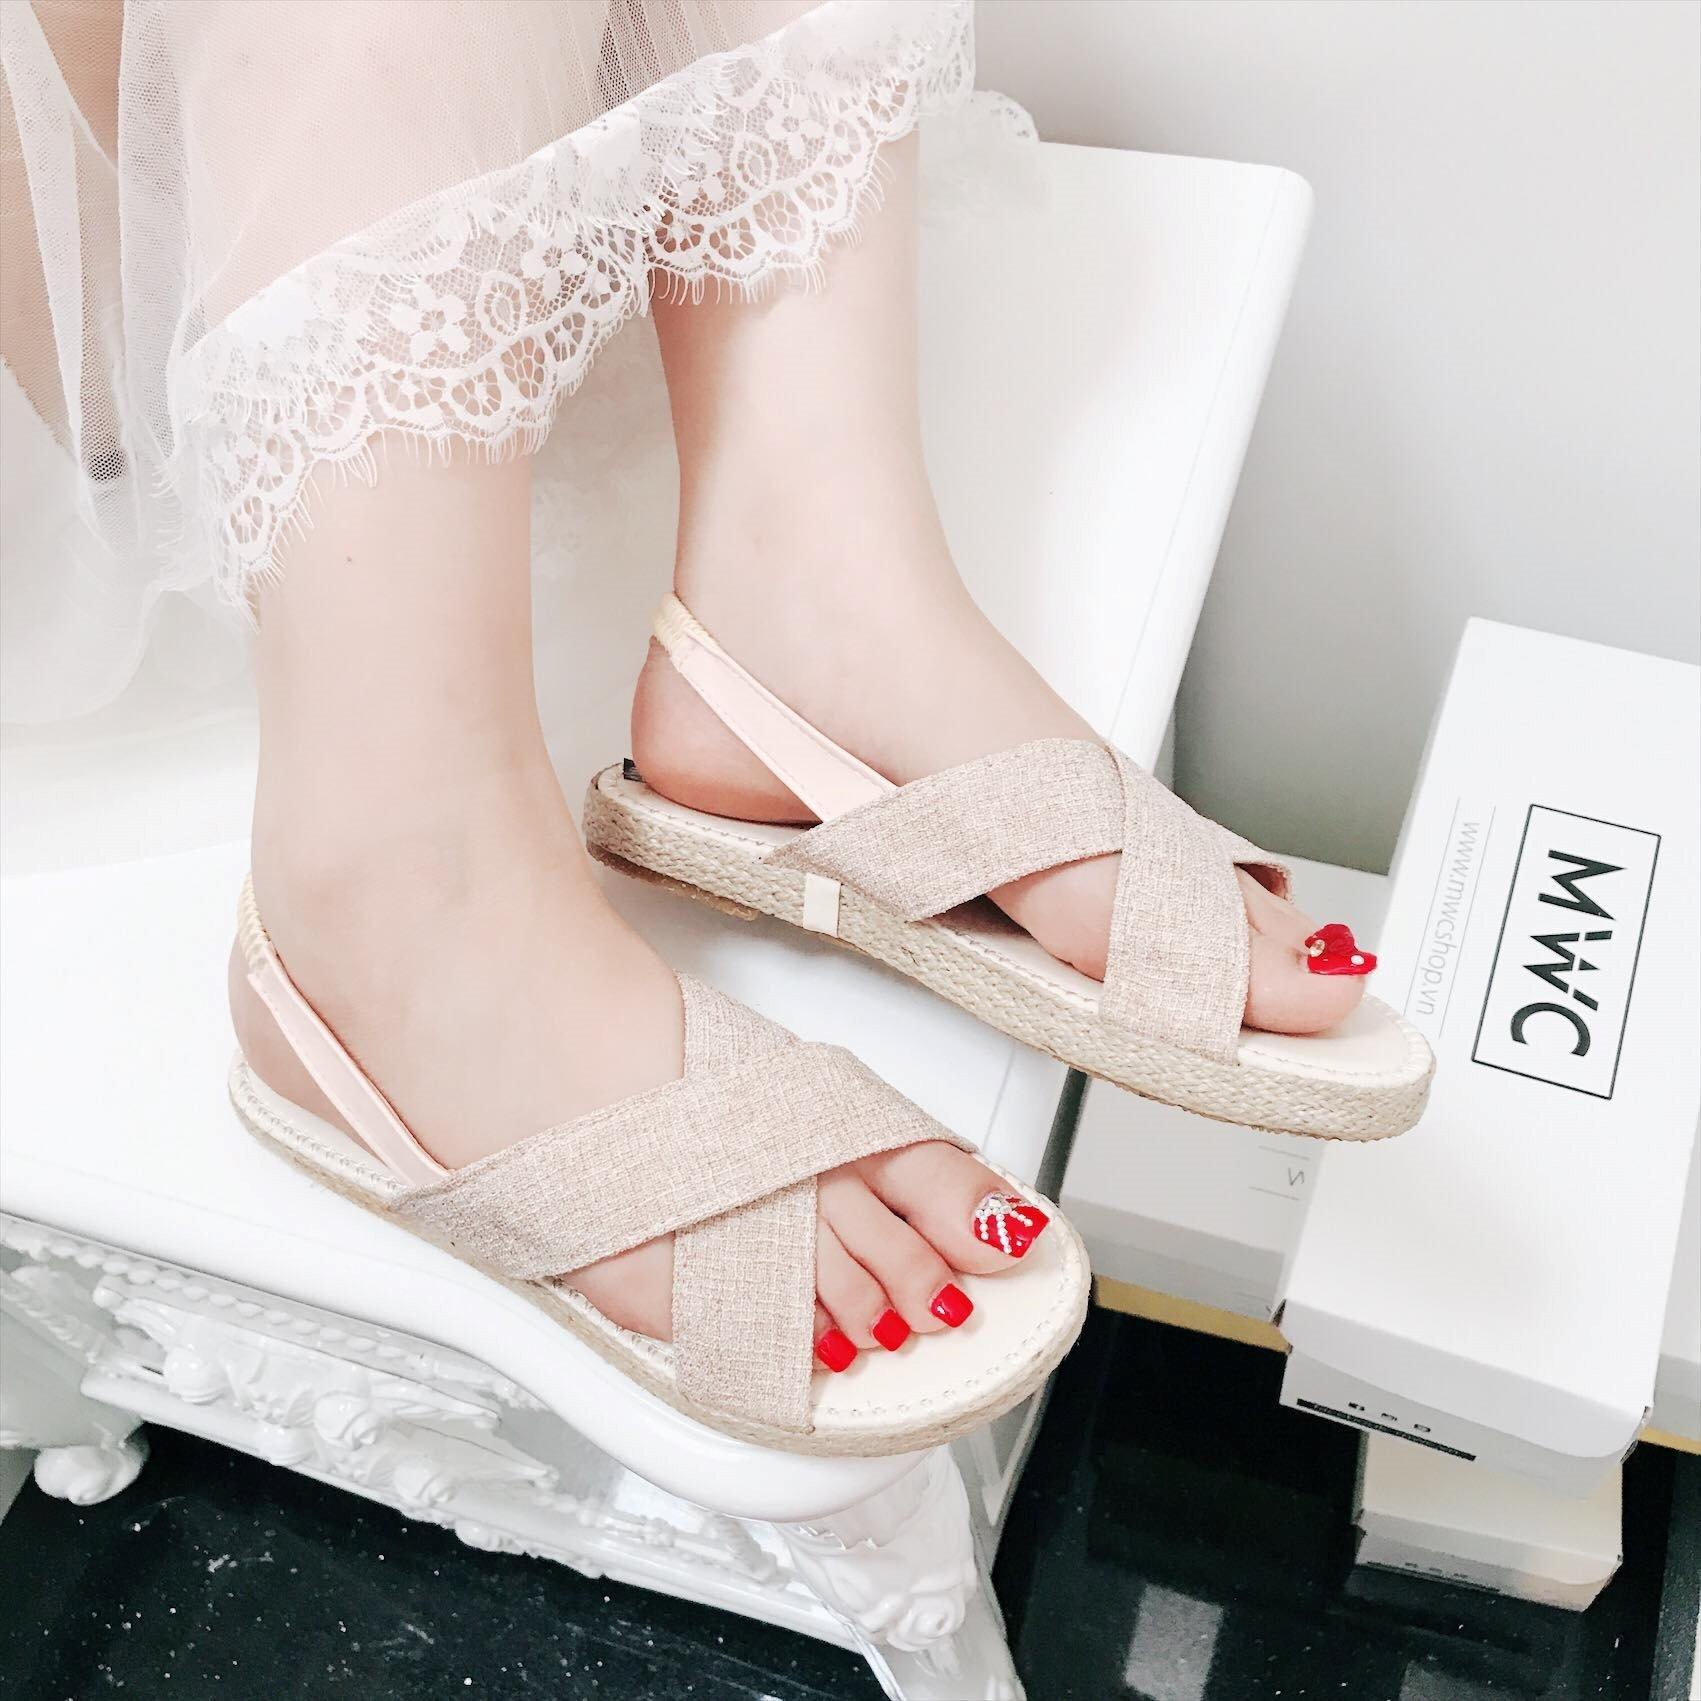 A.Giày sandal nữ MWC NUSD- 2504